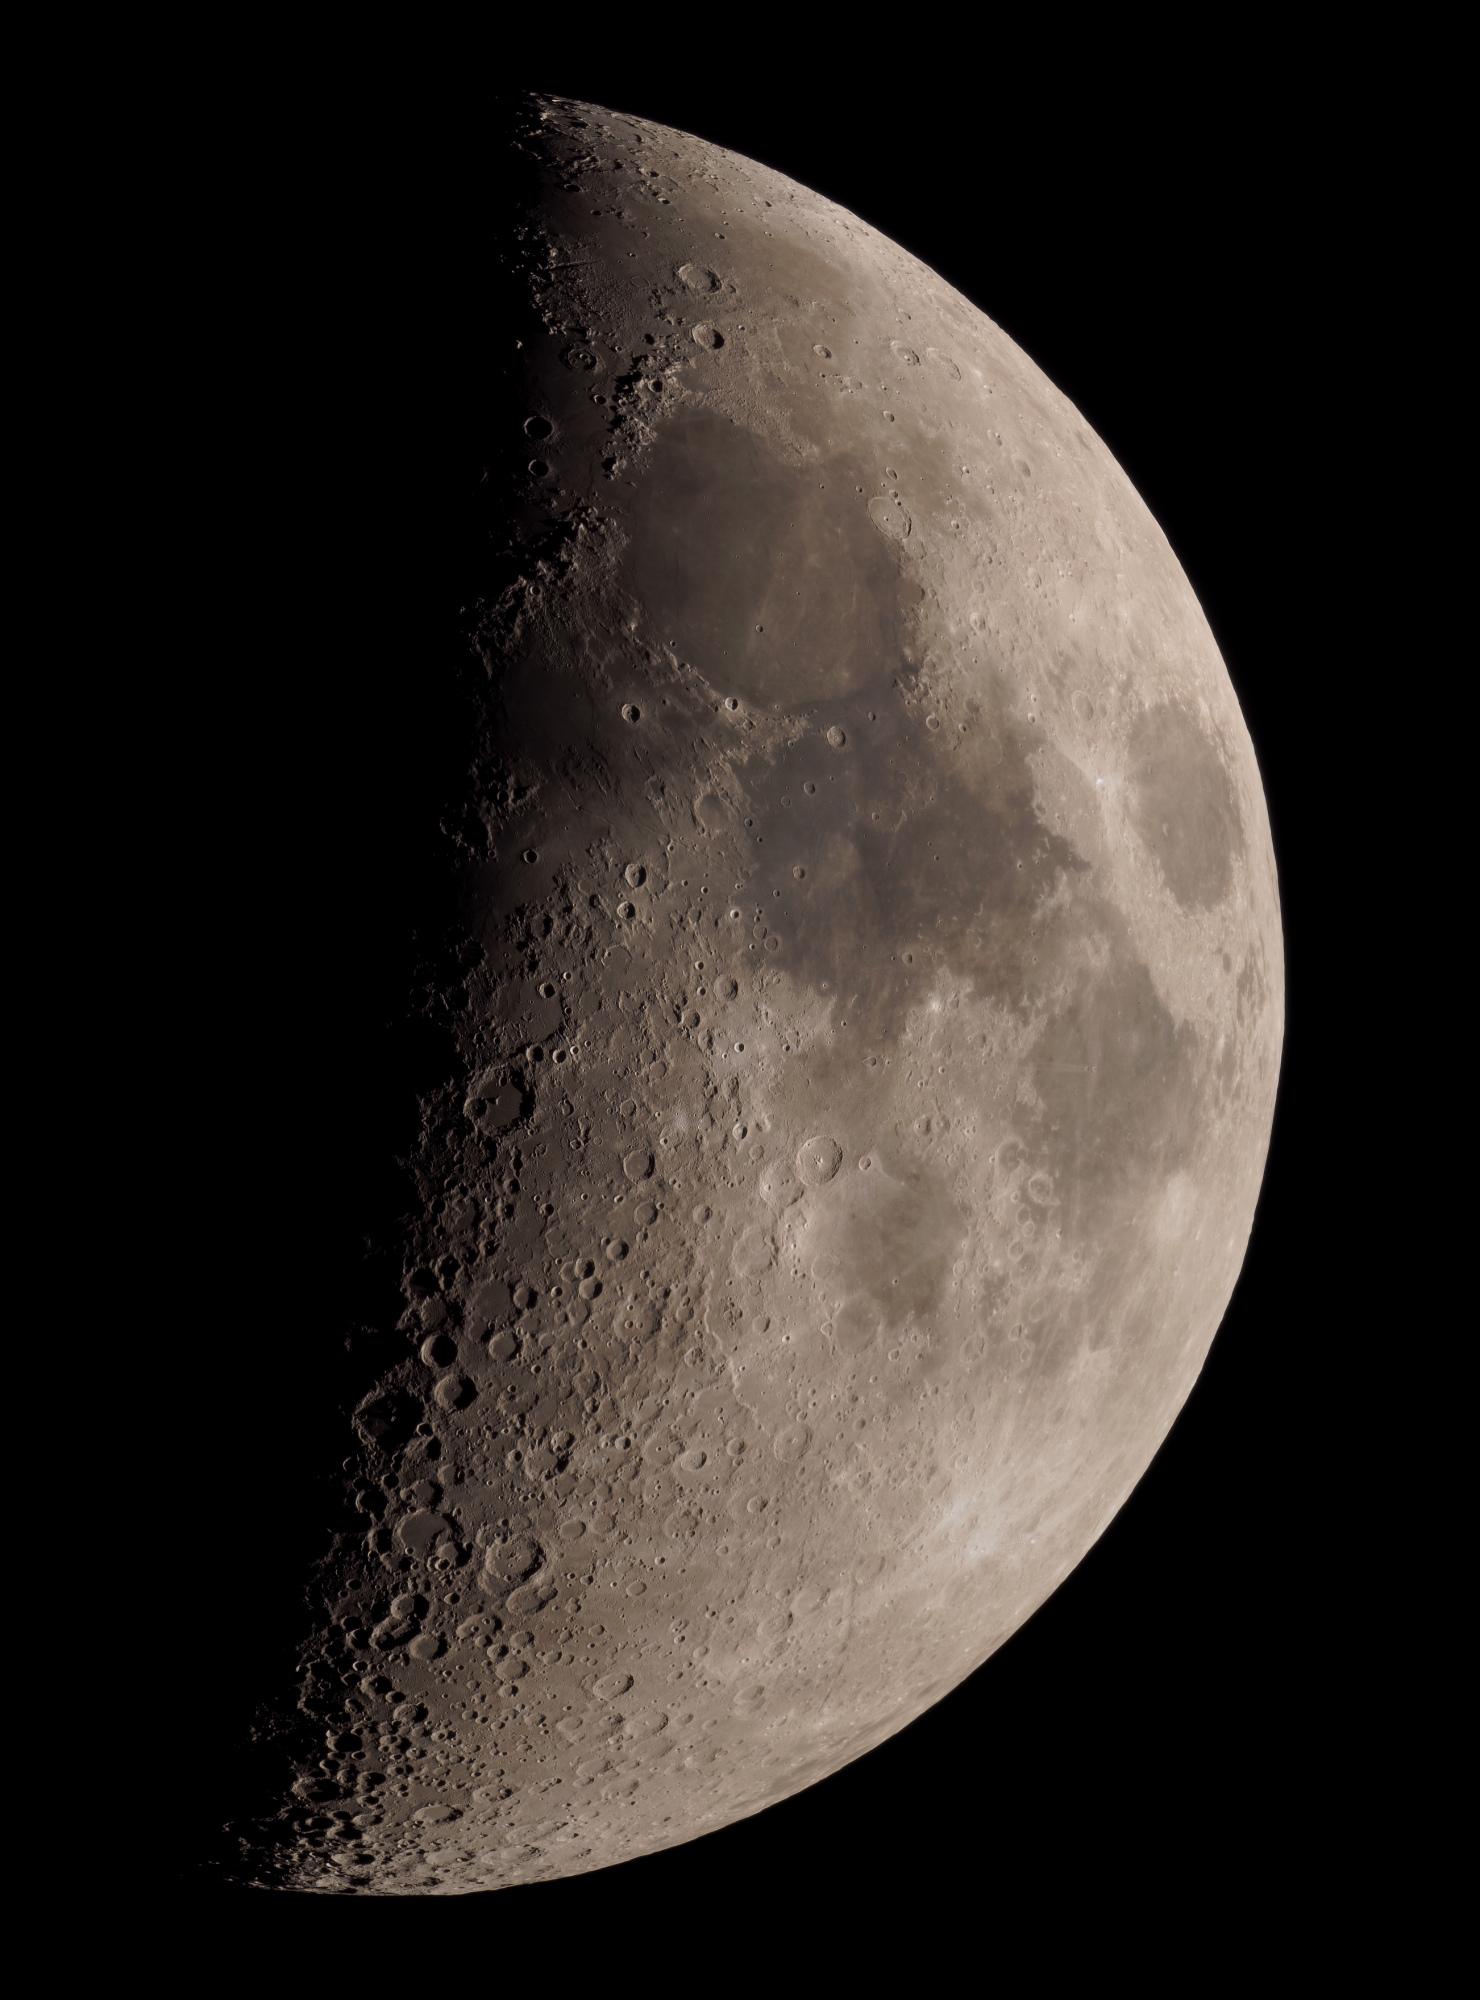 5ed811448355b_lune290520(T250-B2x-A7s-50).thumb.jpg.f535116b849e617b0b7f892cafd27726.jpg